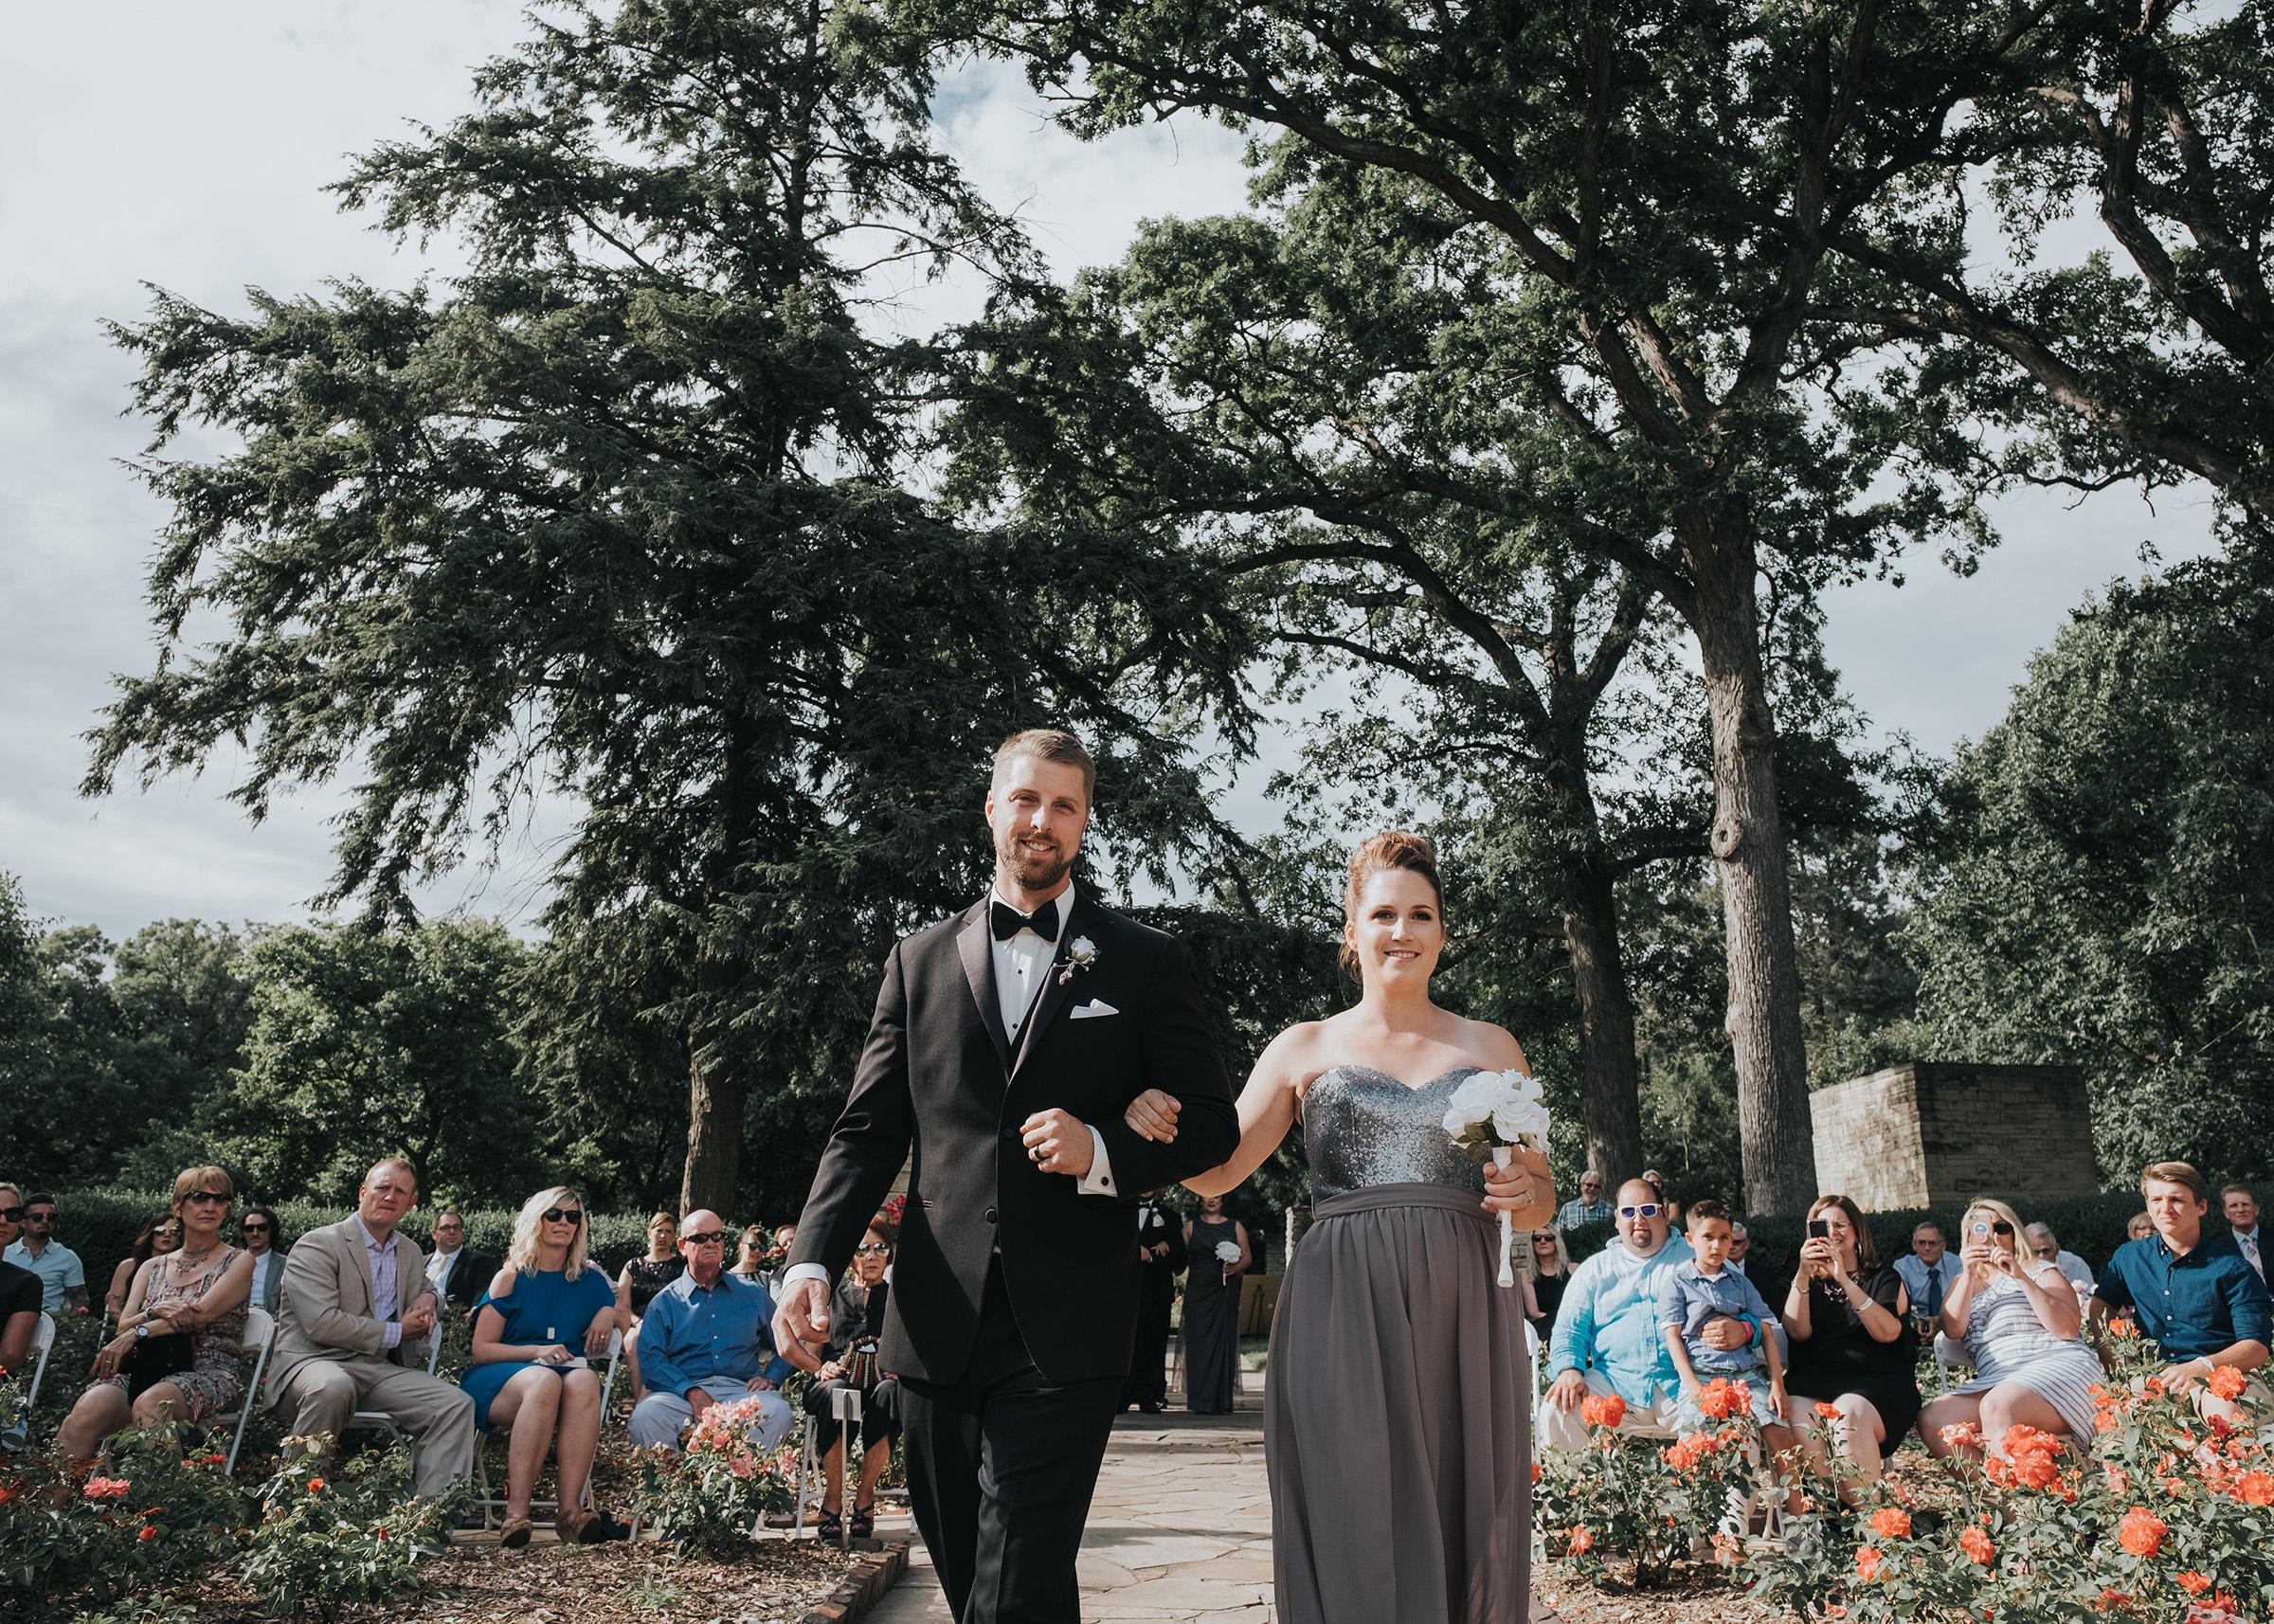 bridesmaid-and-groomsmen-smiling-walking-down-aisle-desmoines-iowa-rose-garden-raelyn-ramey-photography.jpg